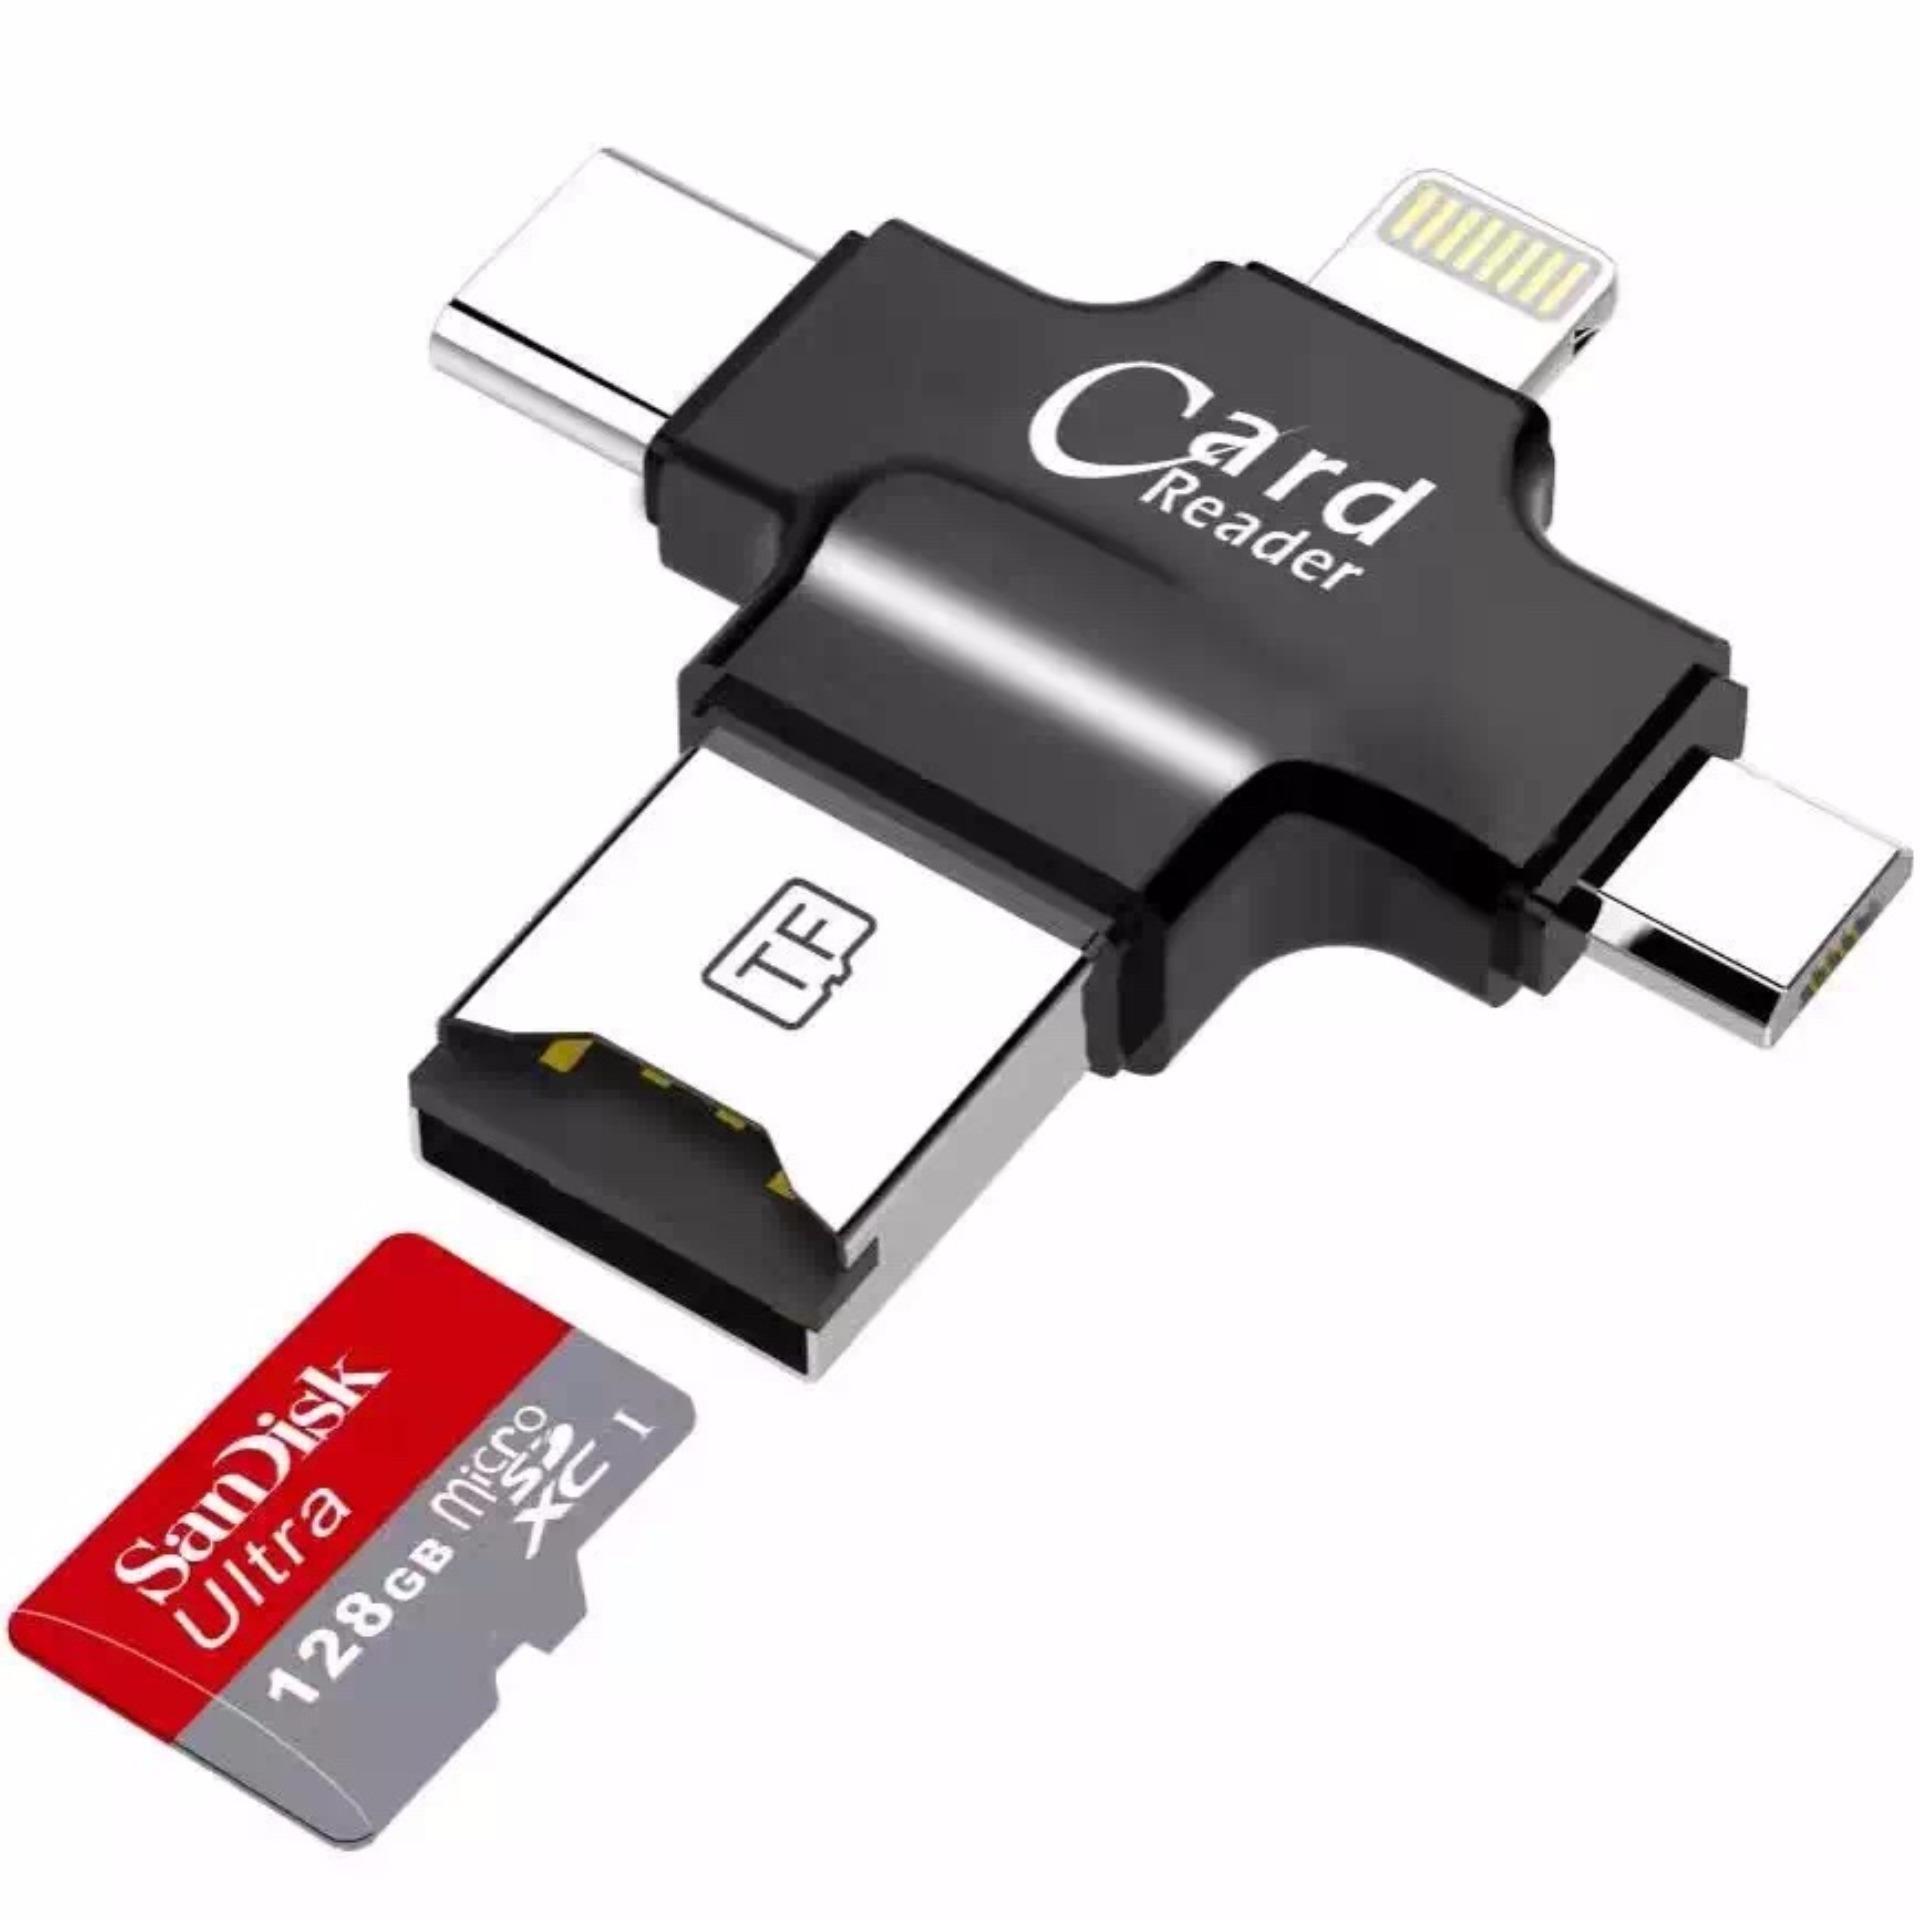 ... LYBALL 4-in-1 USB OTG disebut TF kartu Micro SD Reader USBLightning Type ...